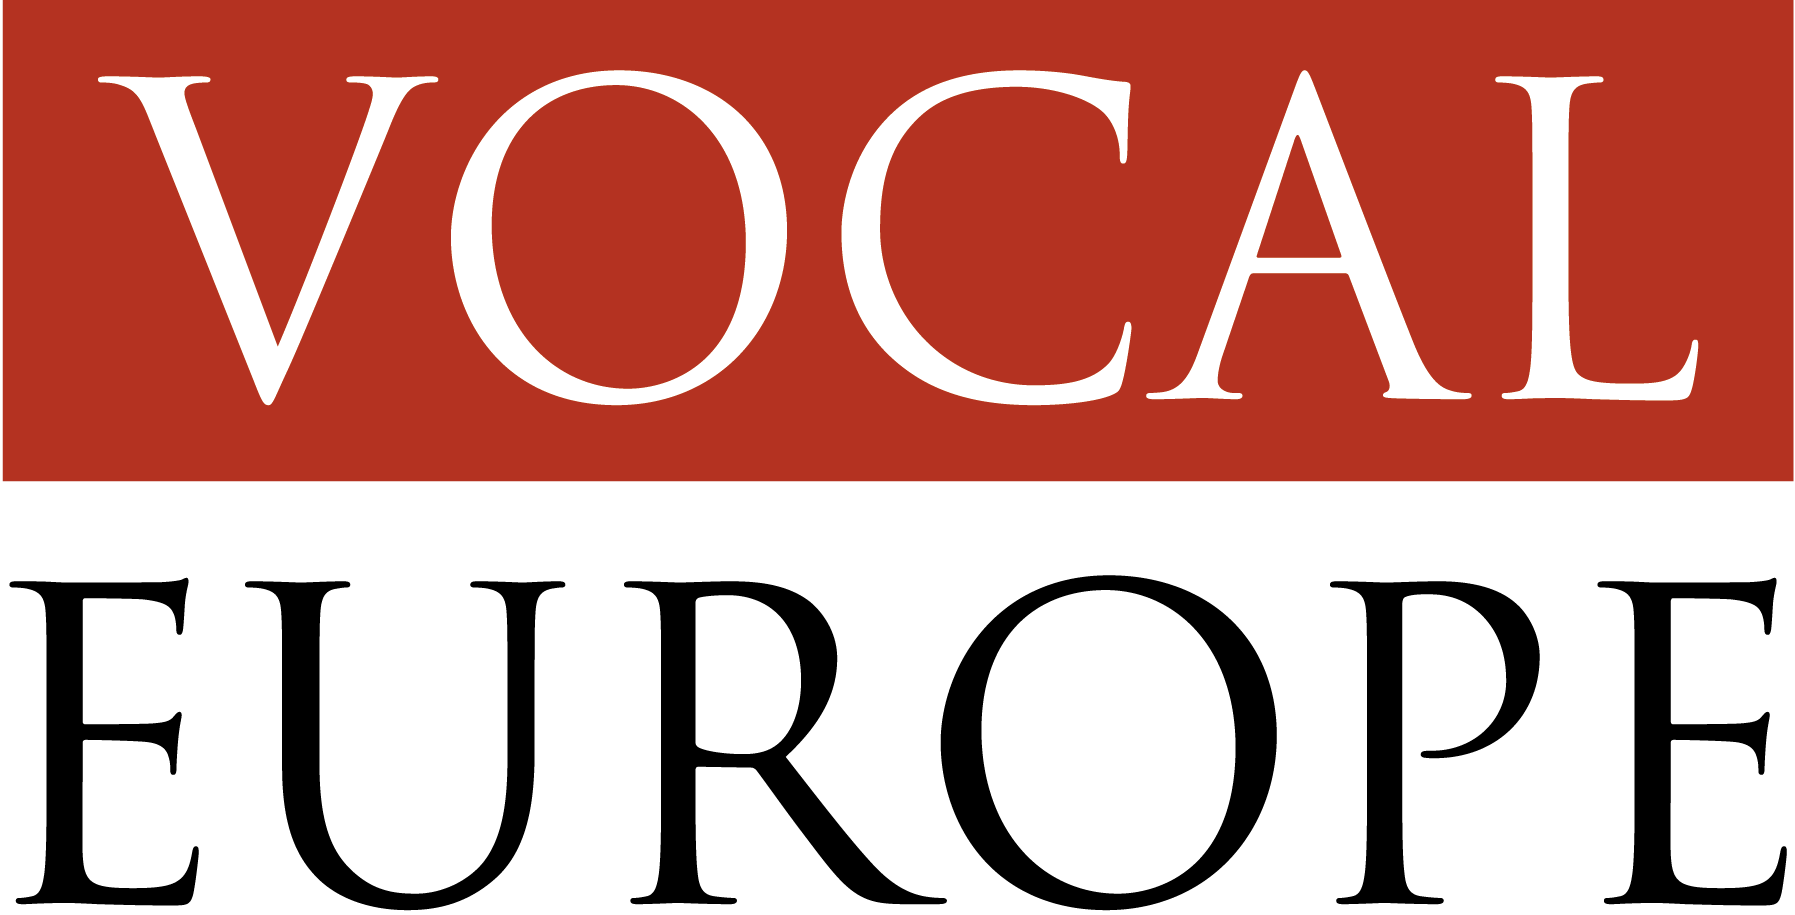 Vocal Europe